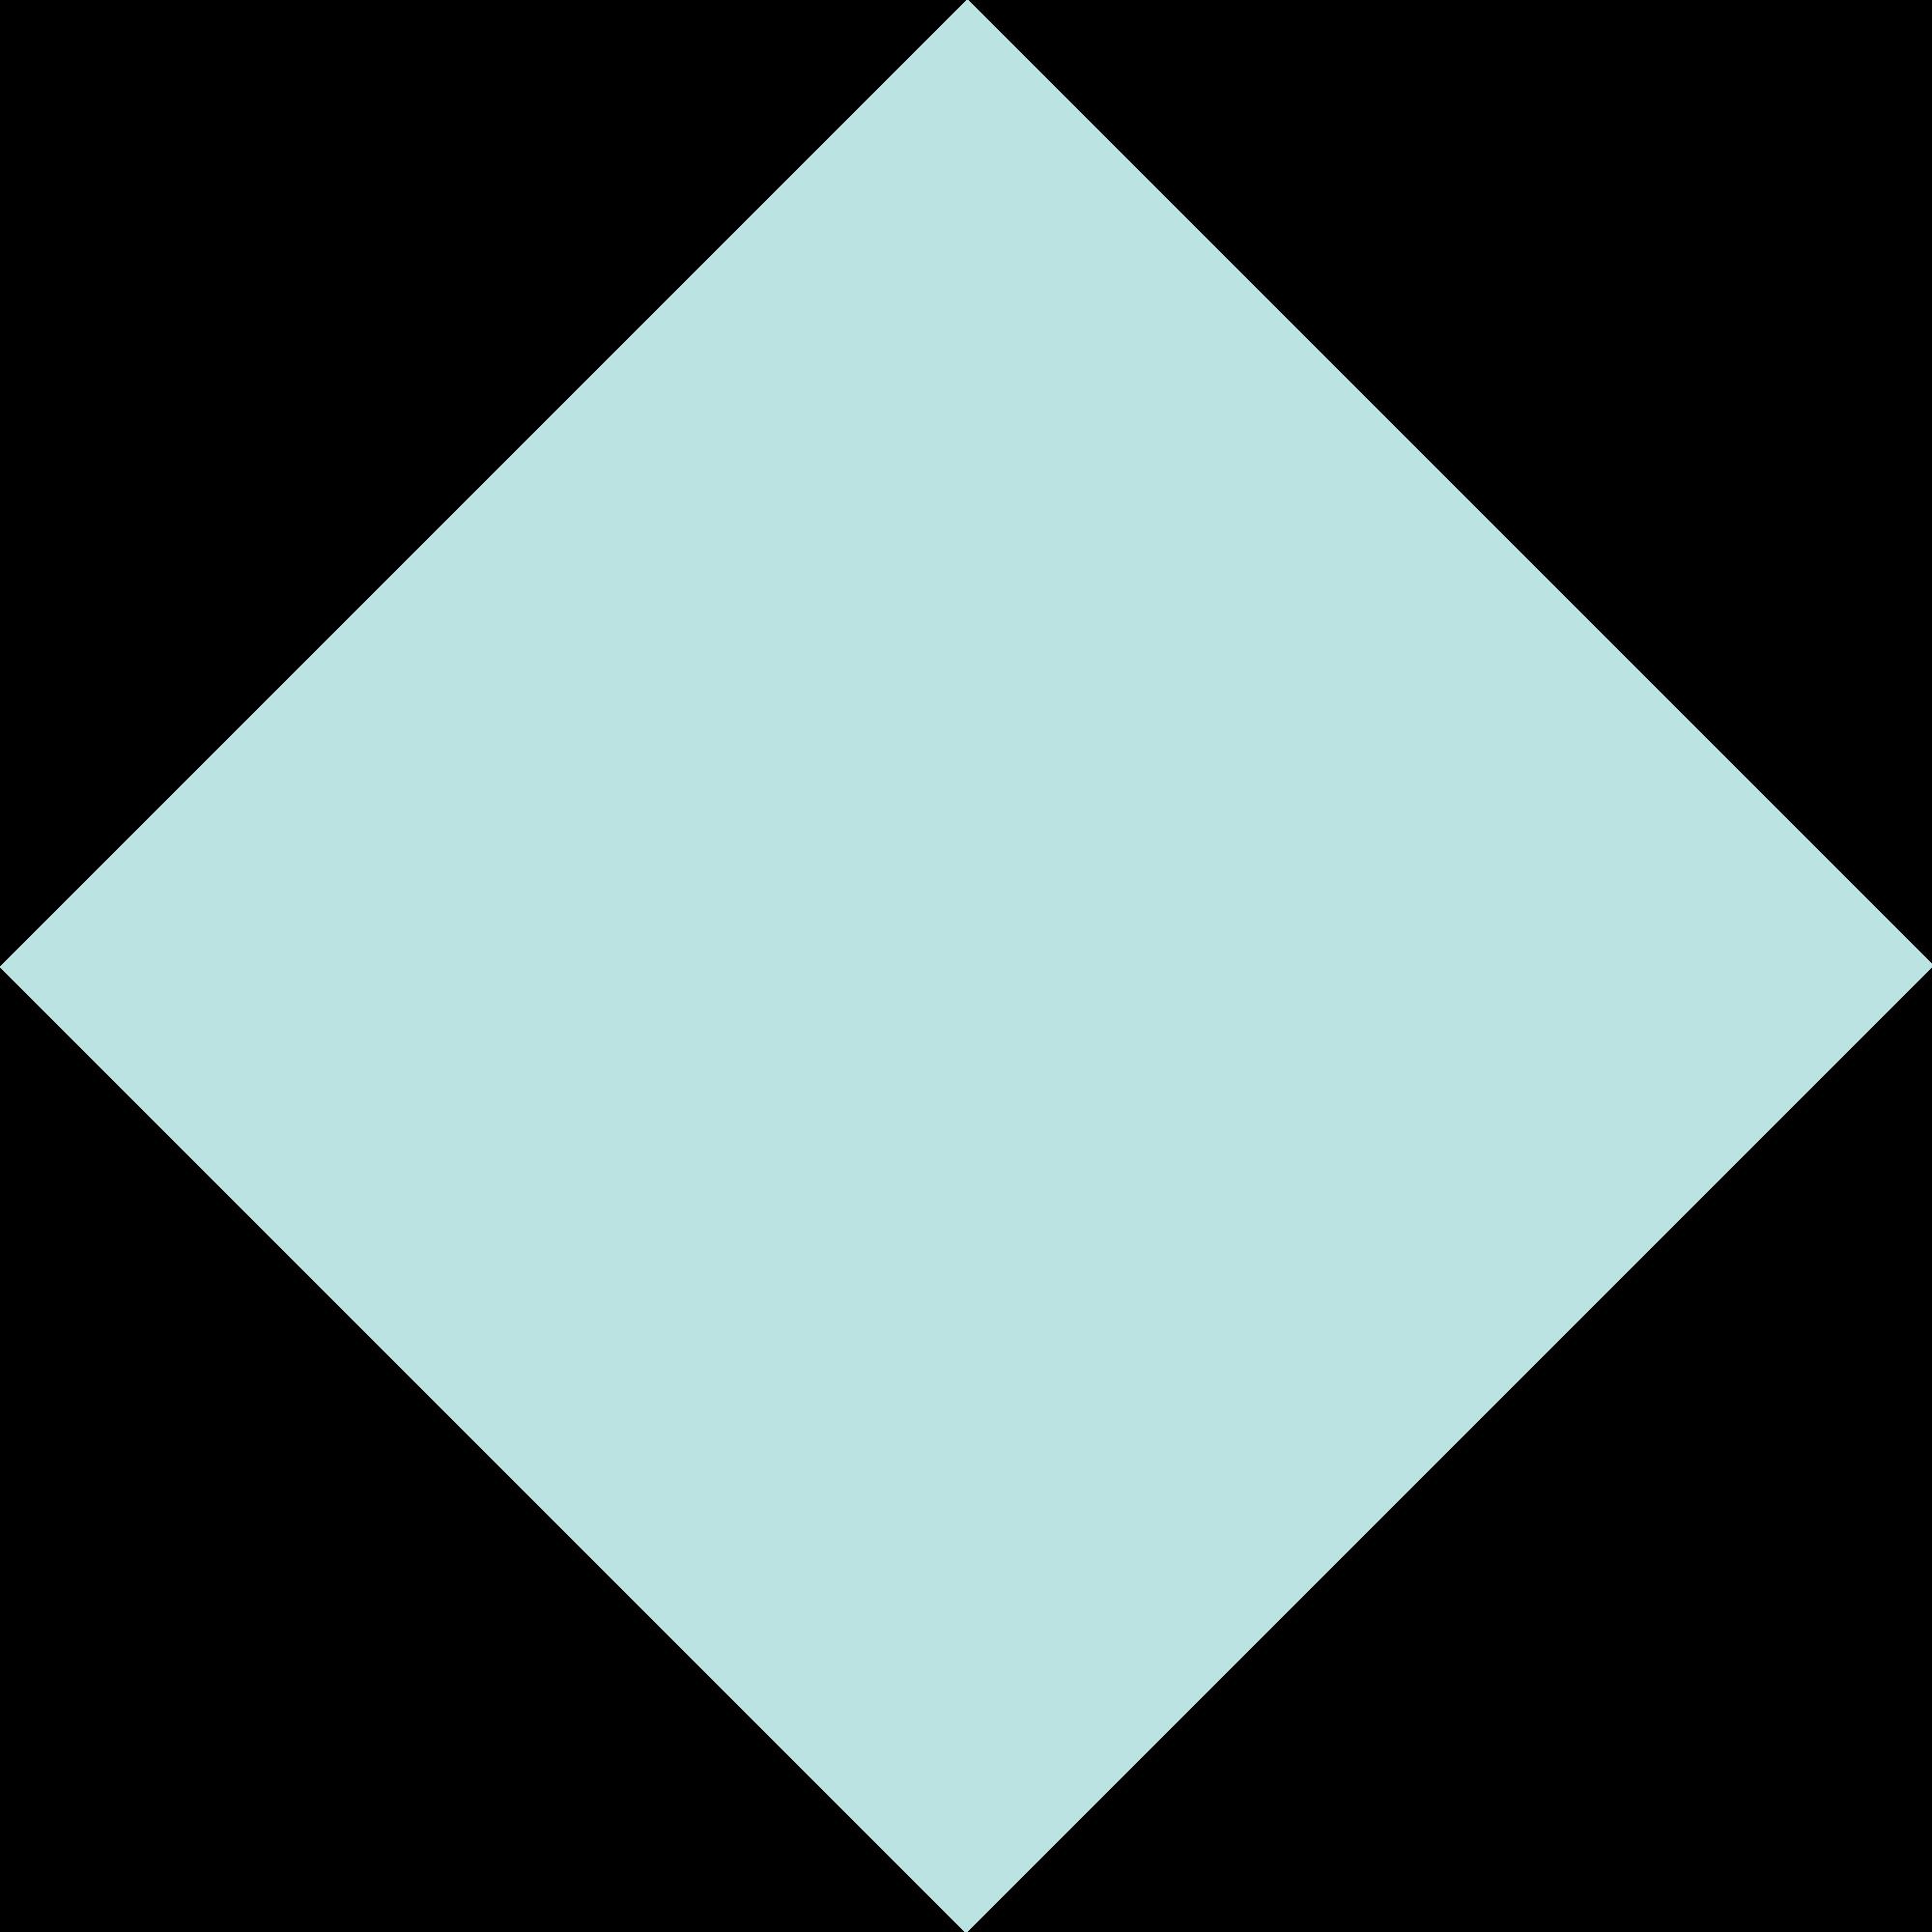 background-diamond.png